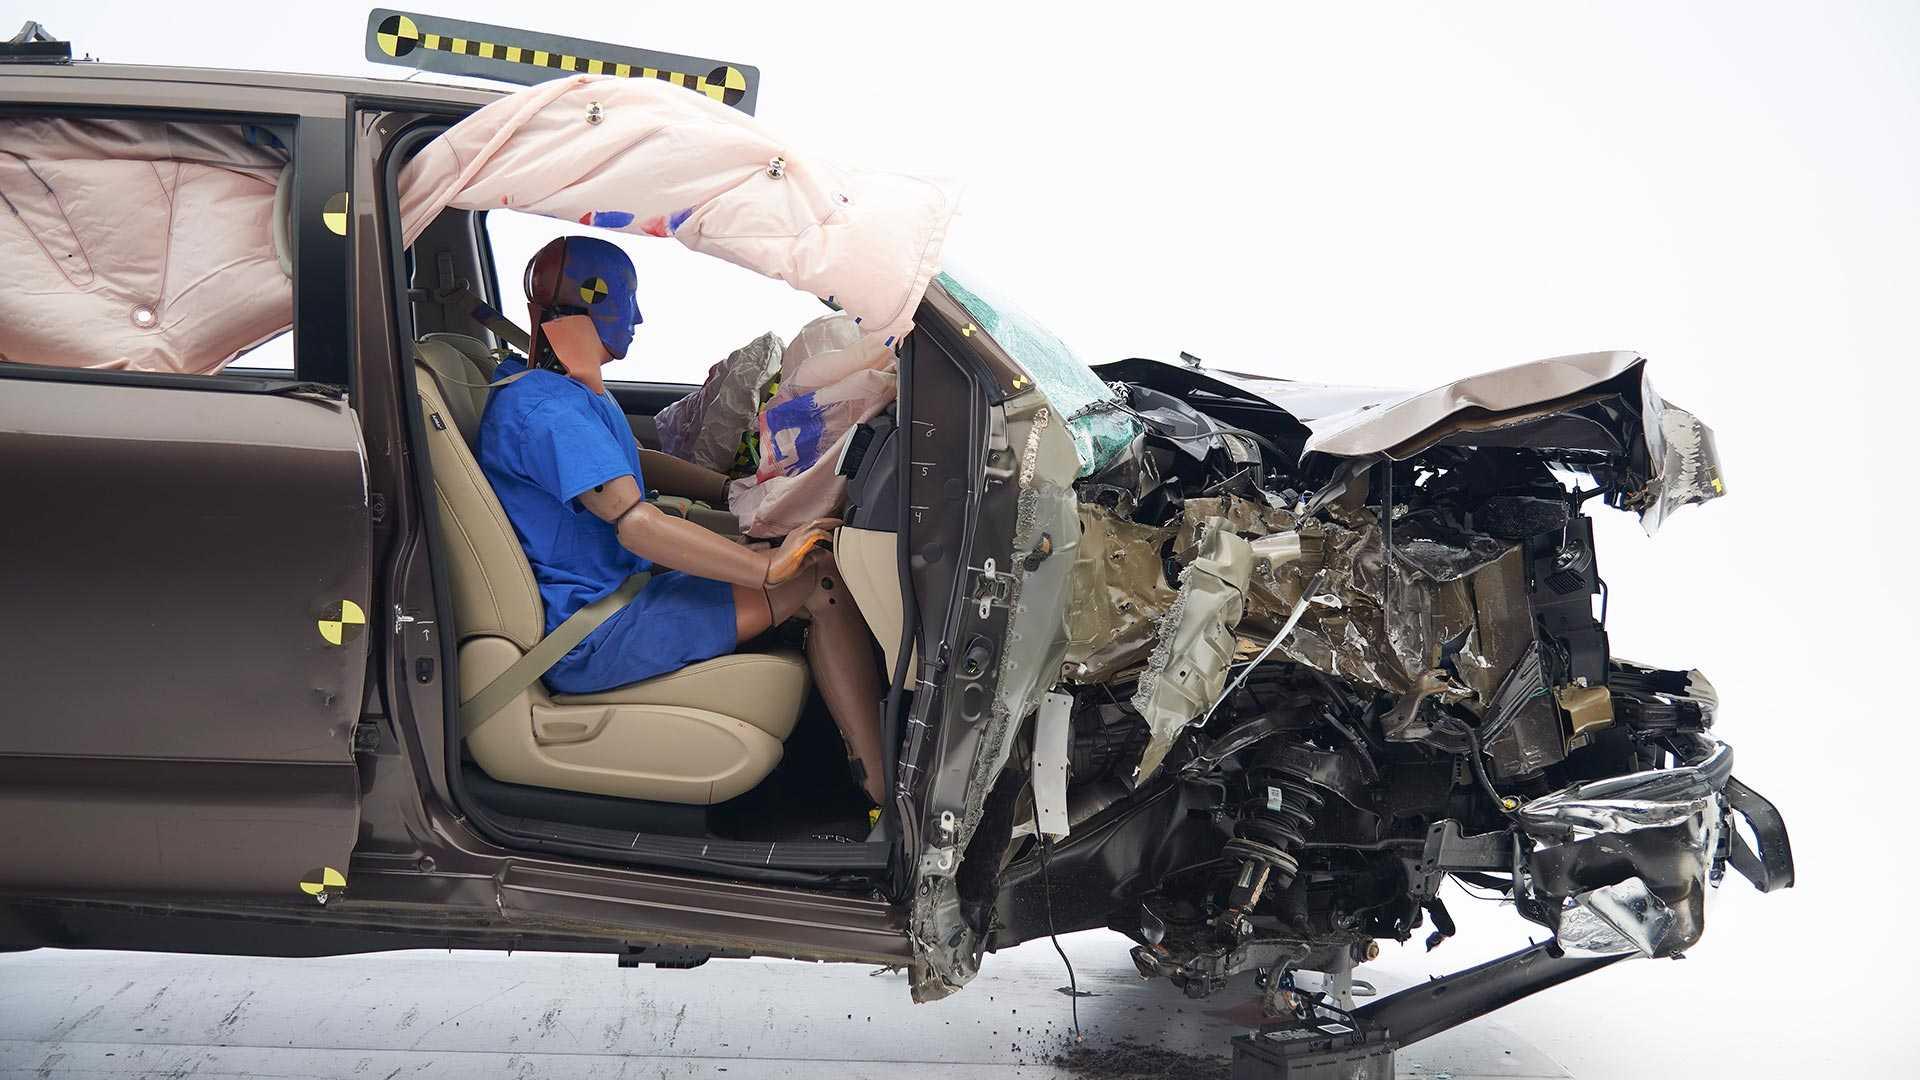 2019-nissan-titan-crew-cab-crash-test (2)